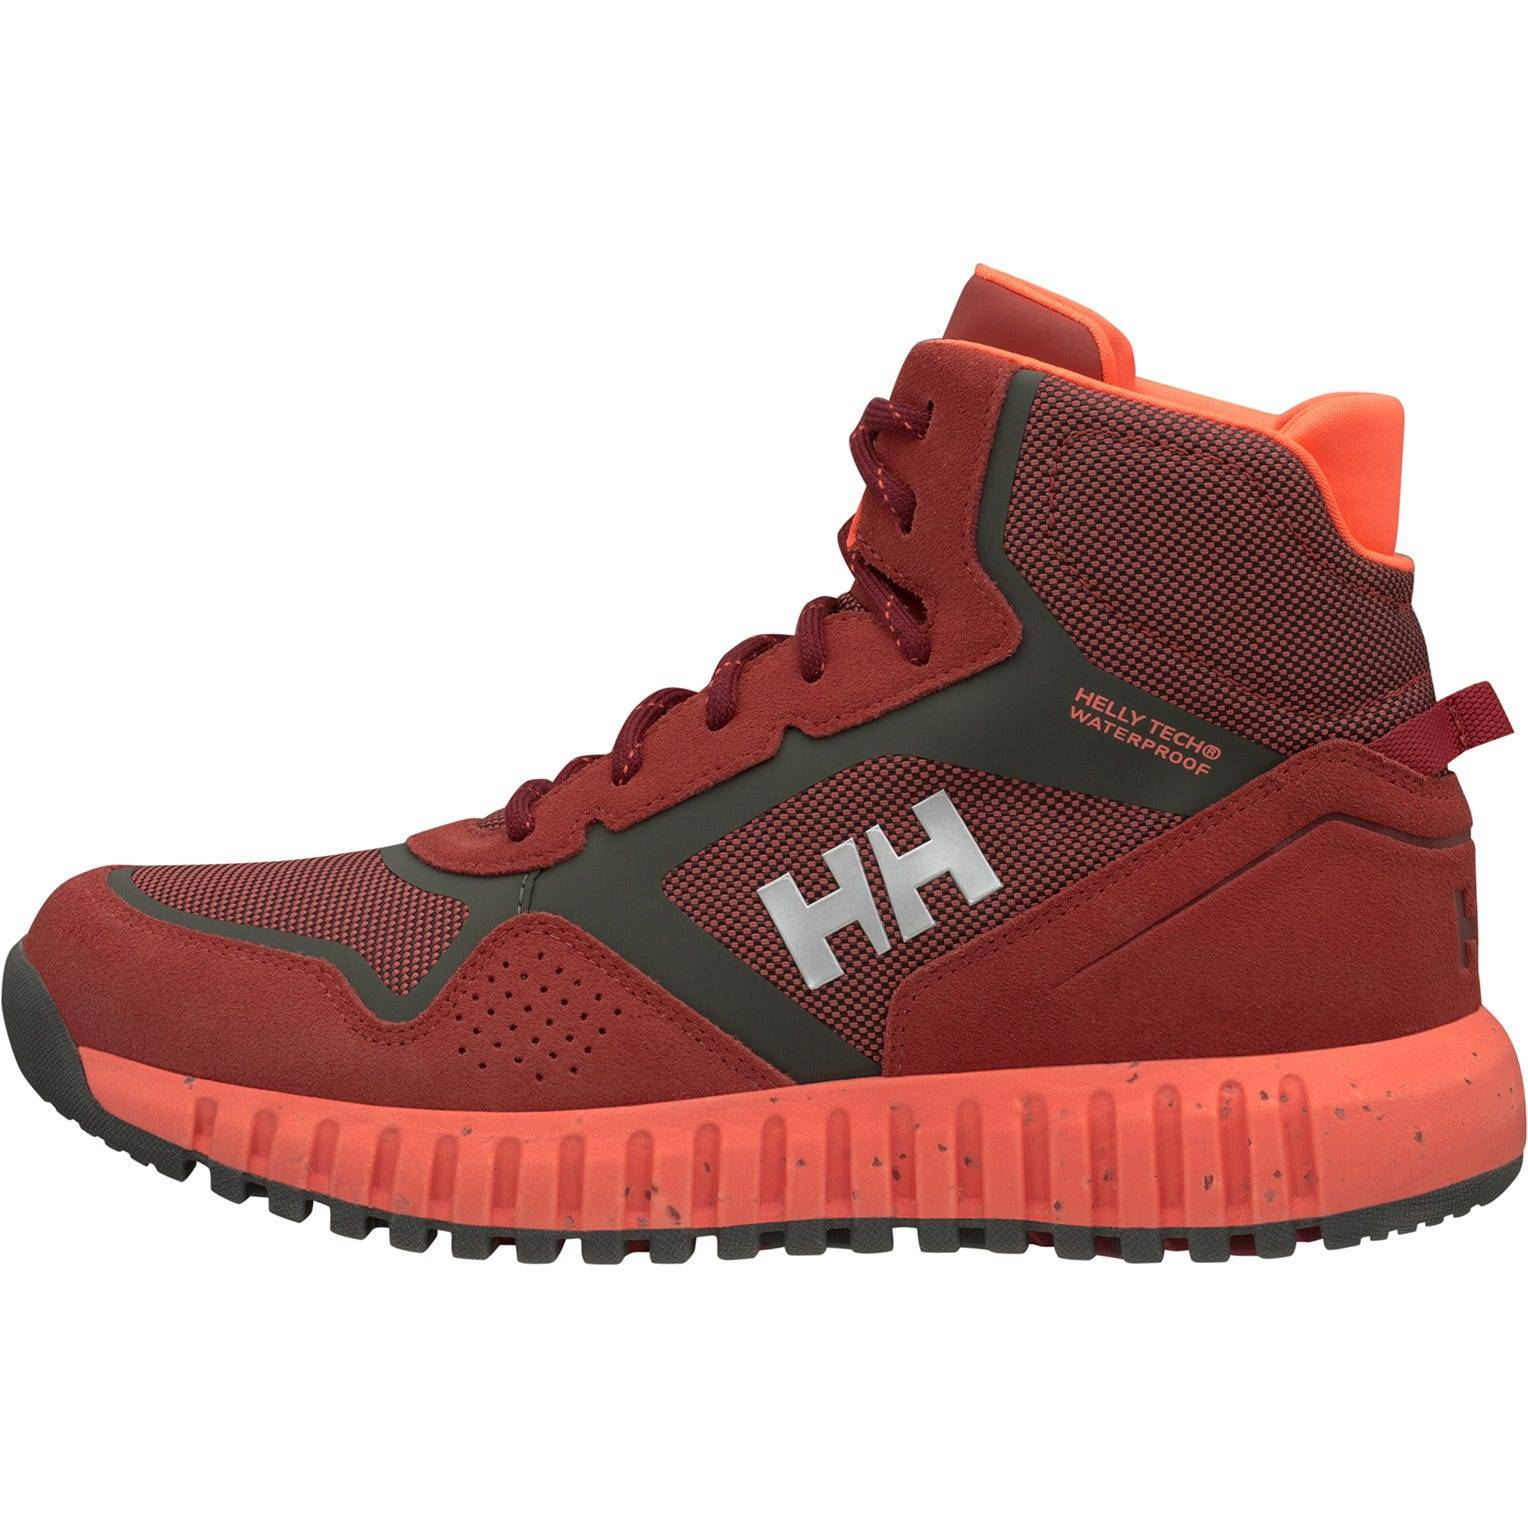 Helly Hansen W Monashee Ullr Ht Womens Hiking Boot Red 39.3/8